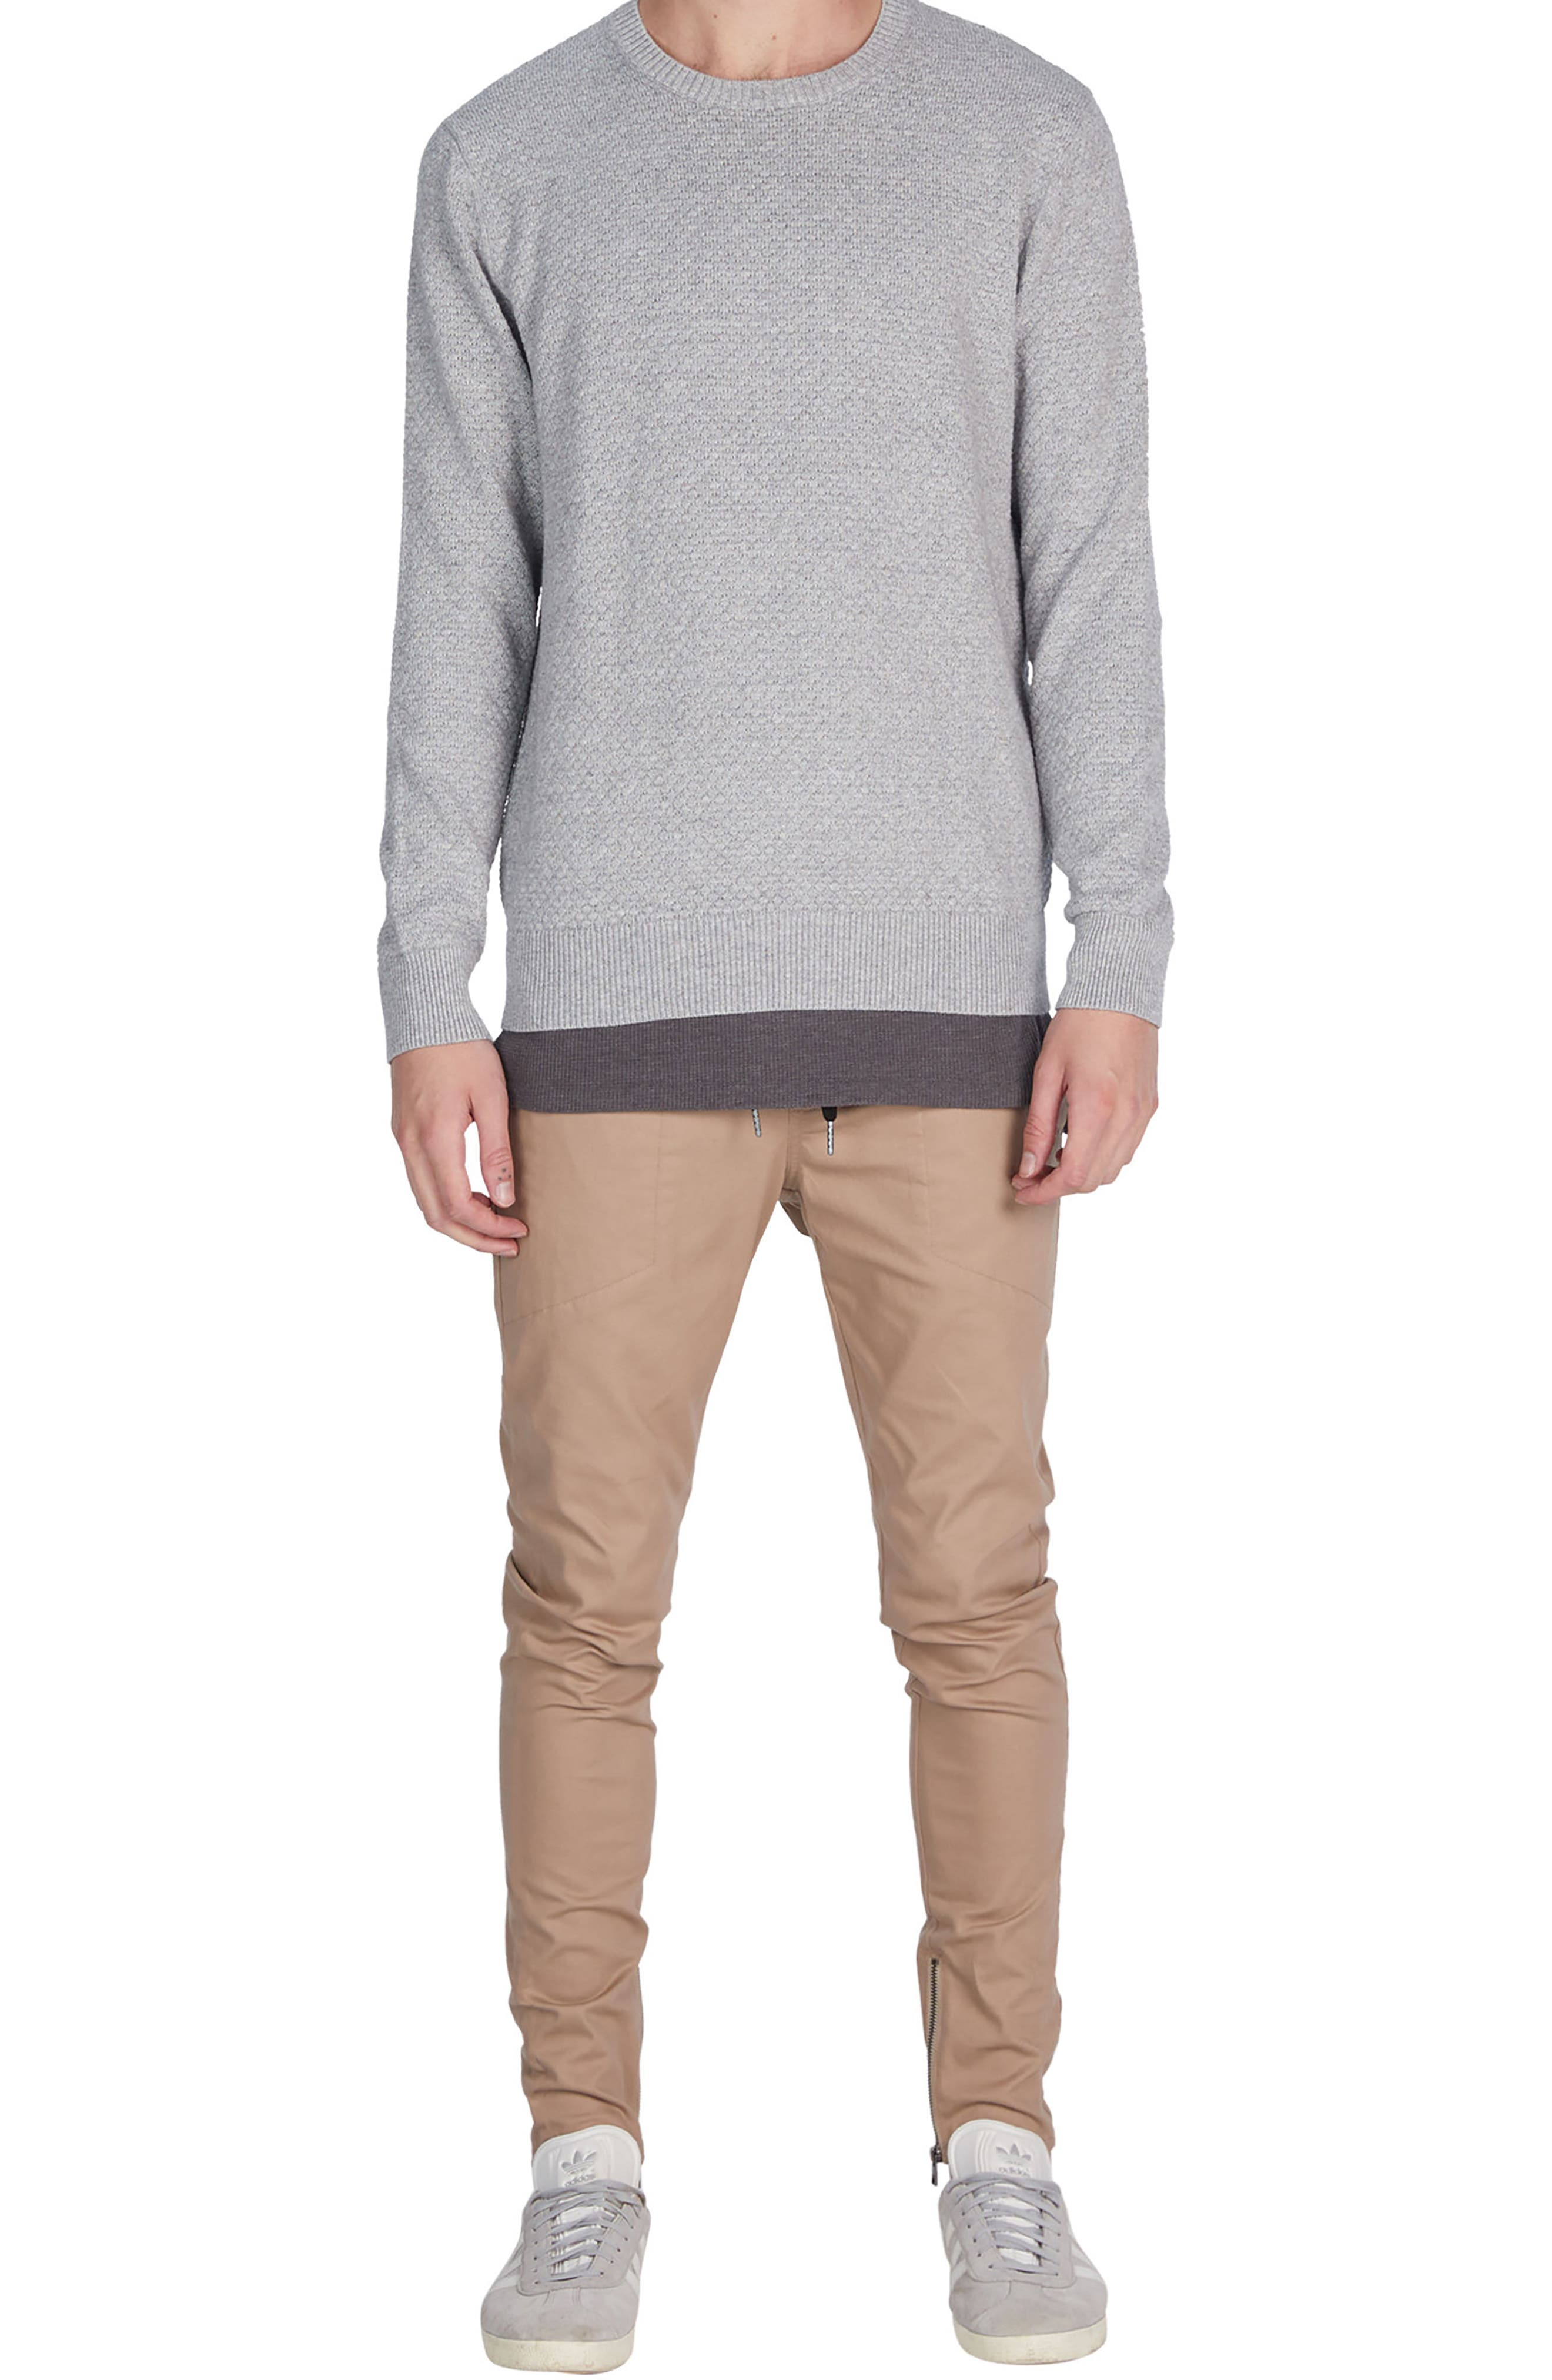 Grip Crewneck Sweater,                             Alternate thumbnail 5, color,                             Grey Marle